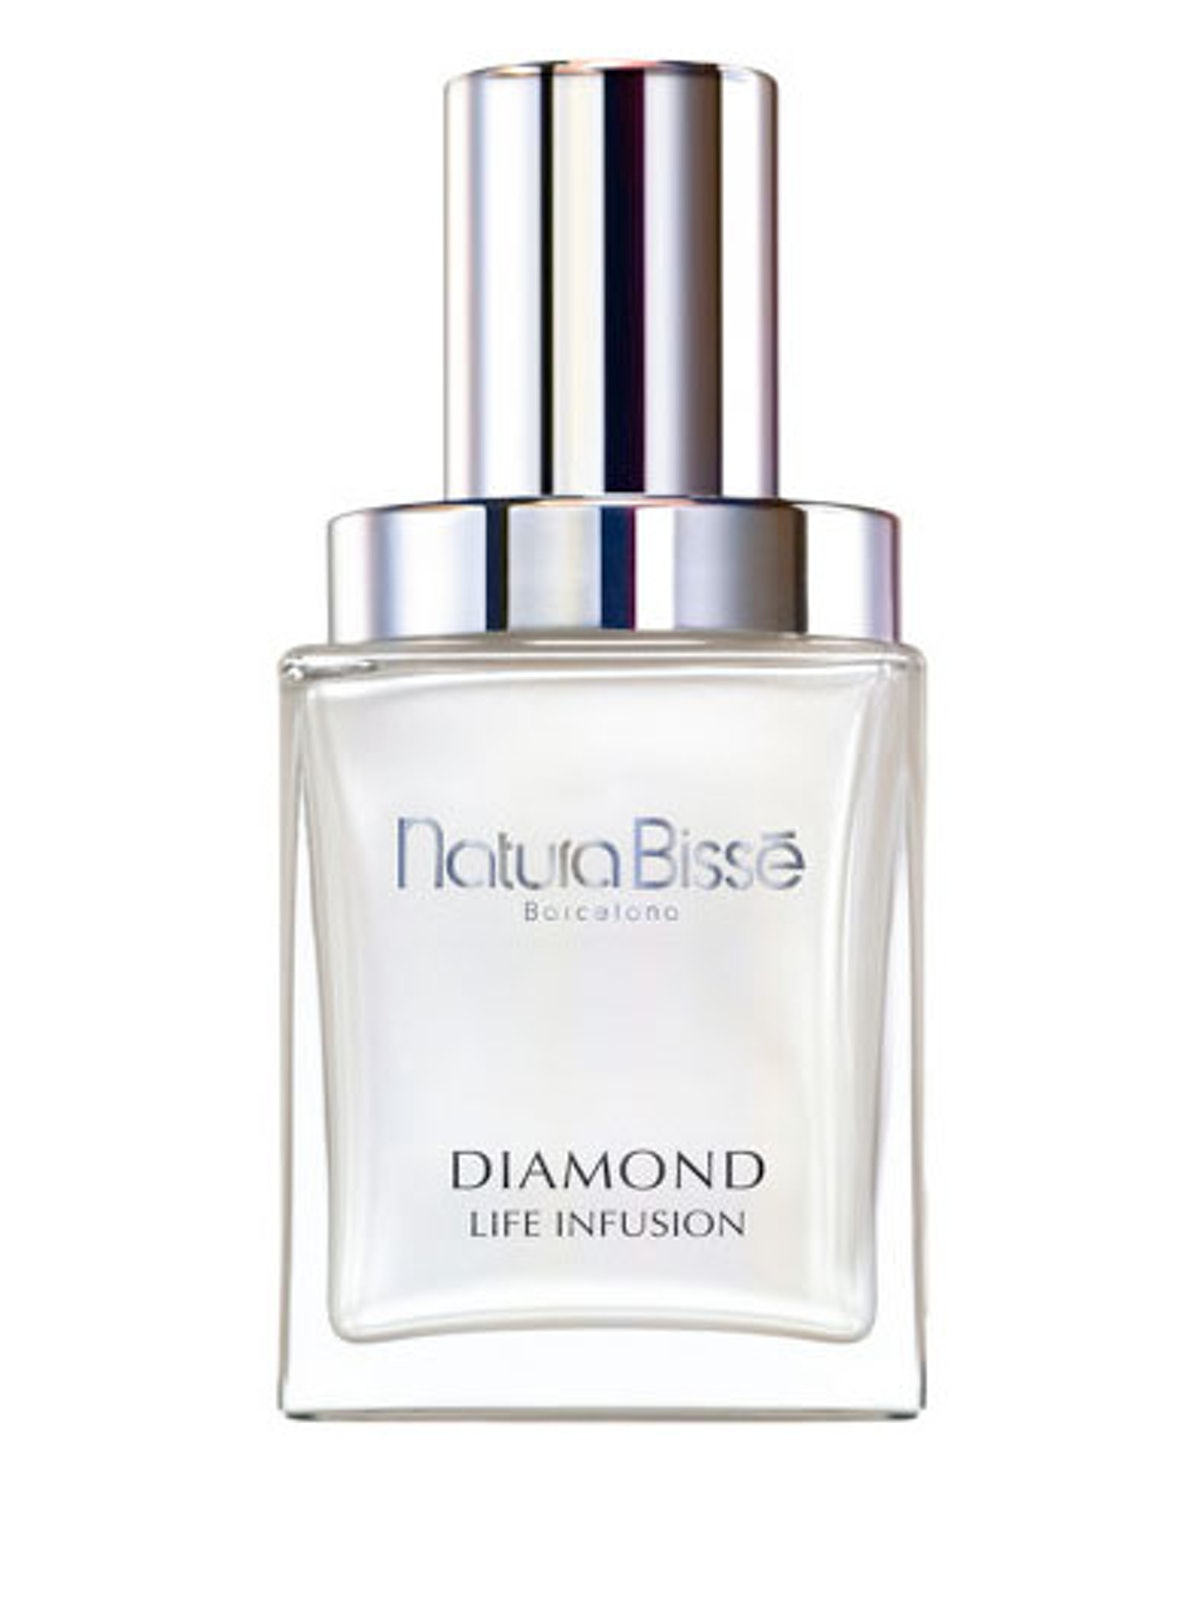 NaturaBisse diamond life infusion